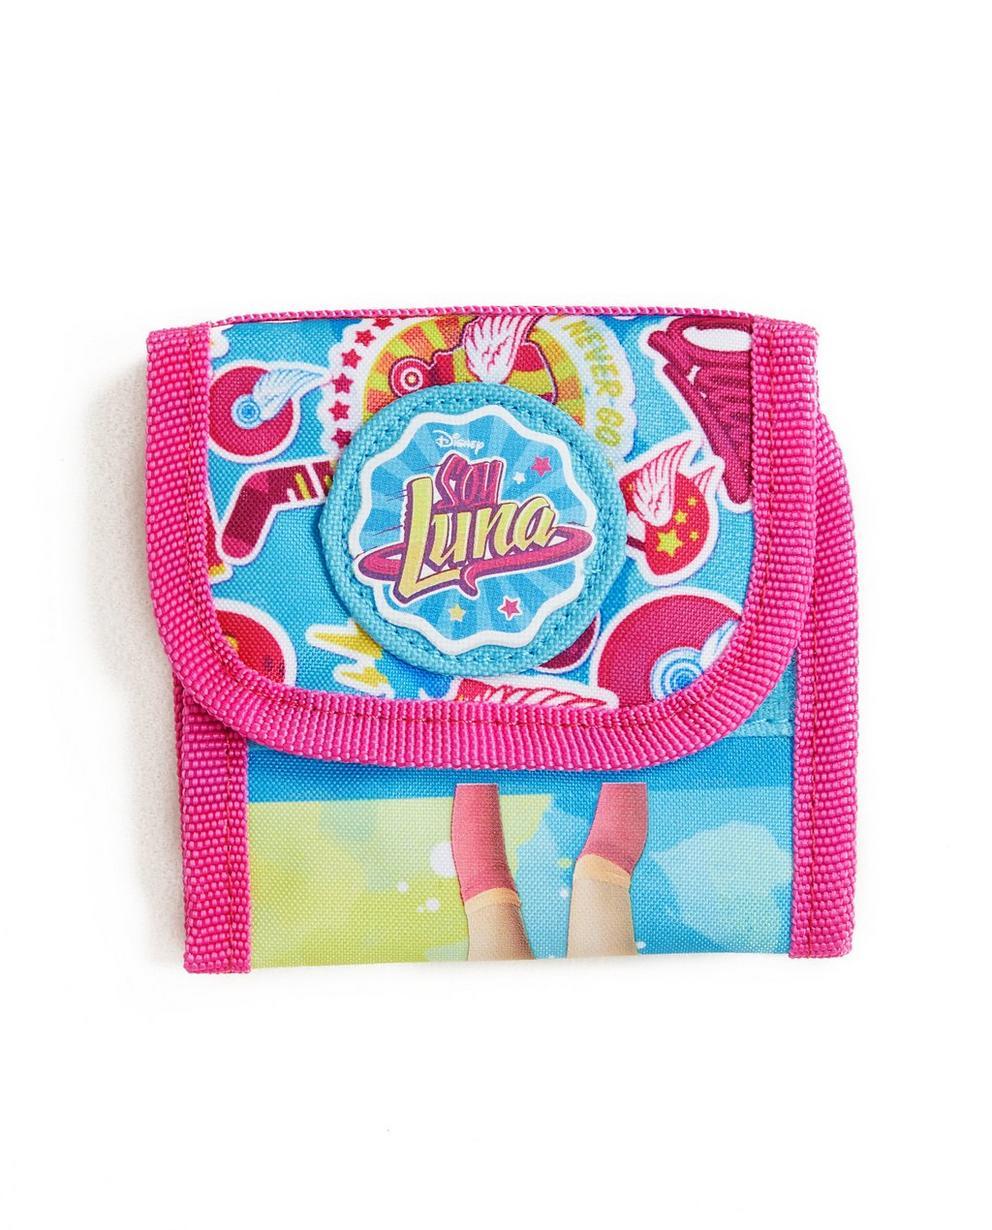 Portemonnaie mit Print - Soy Luna - none